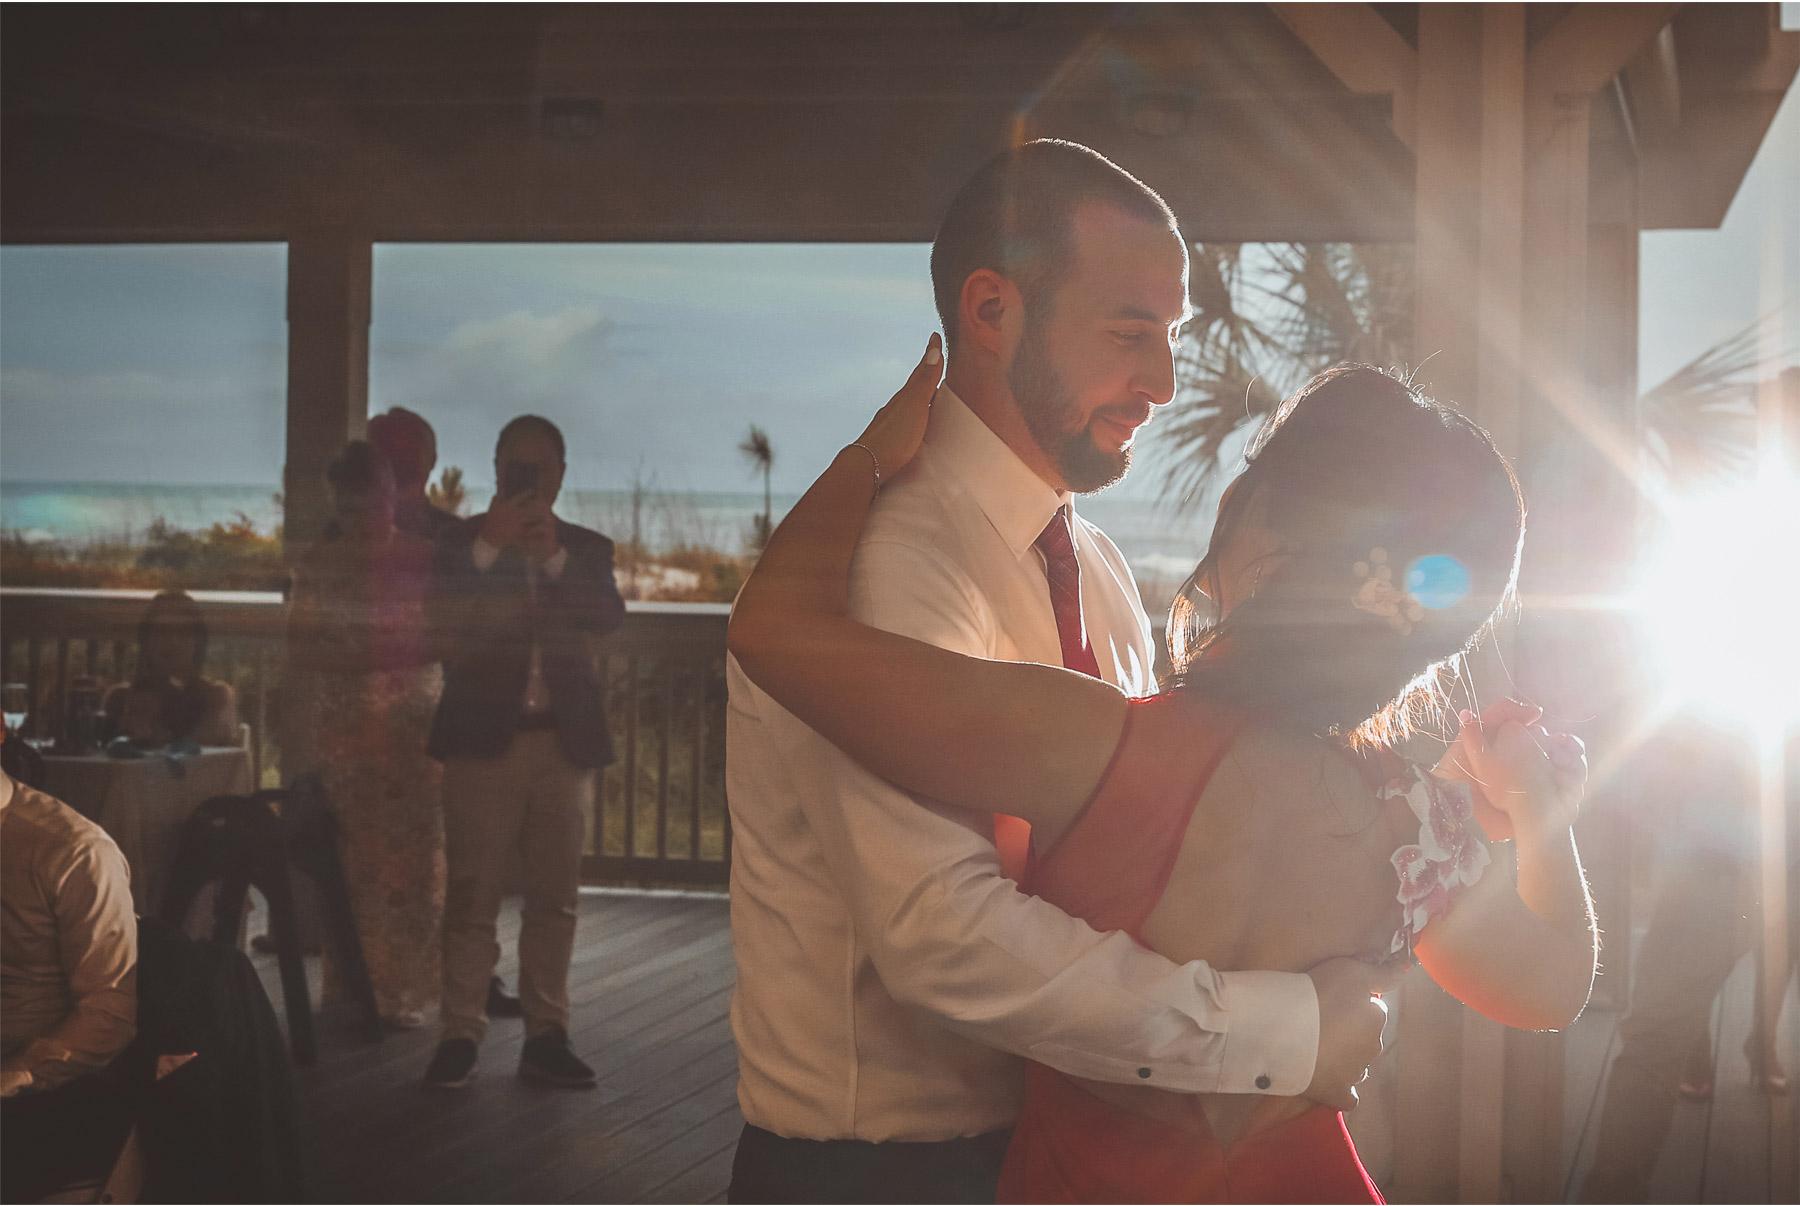 24-South-Carolina-Wedding-by-Vick-Photography-Hilton-Head-Island-Omni-Oceanfront-Hotel-Destination-Reception-Dance-Felyn-and-Will.jpg